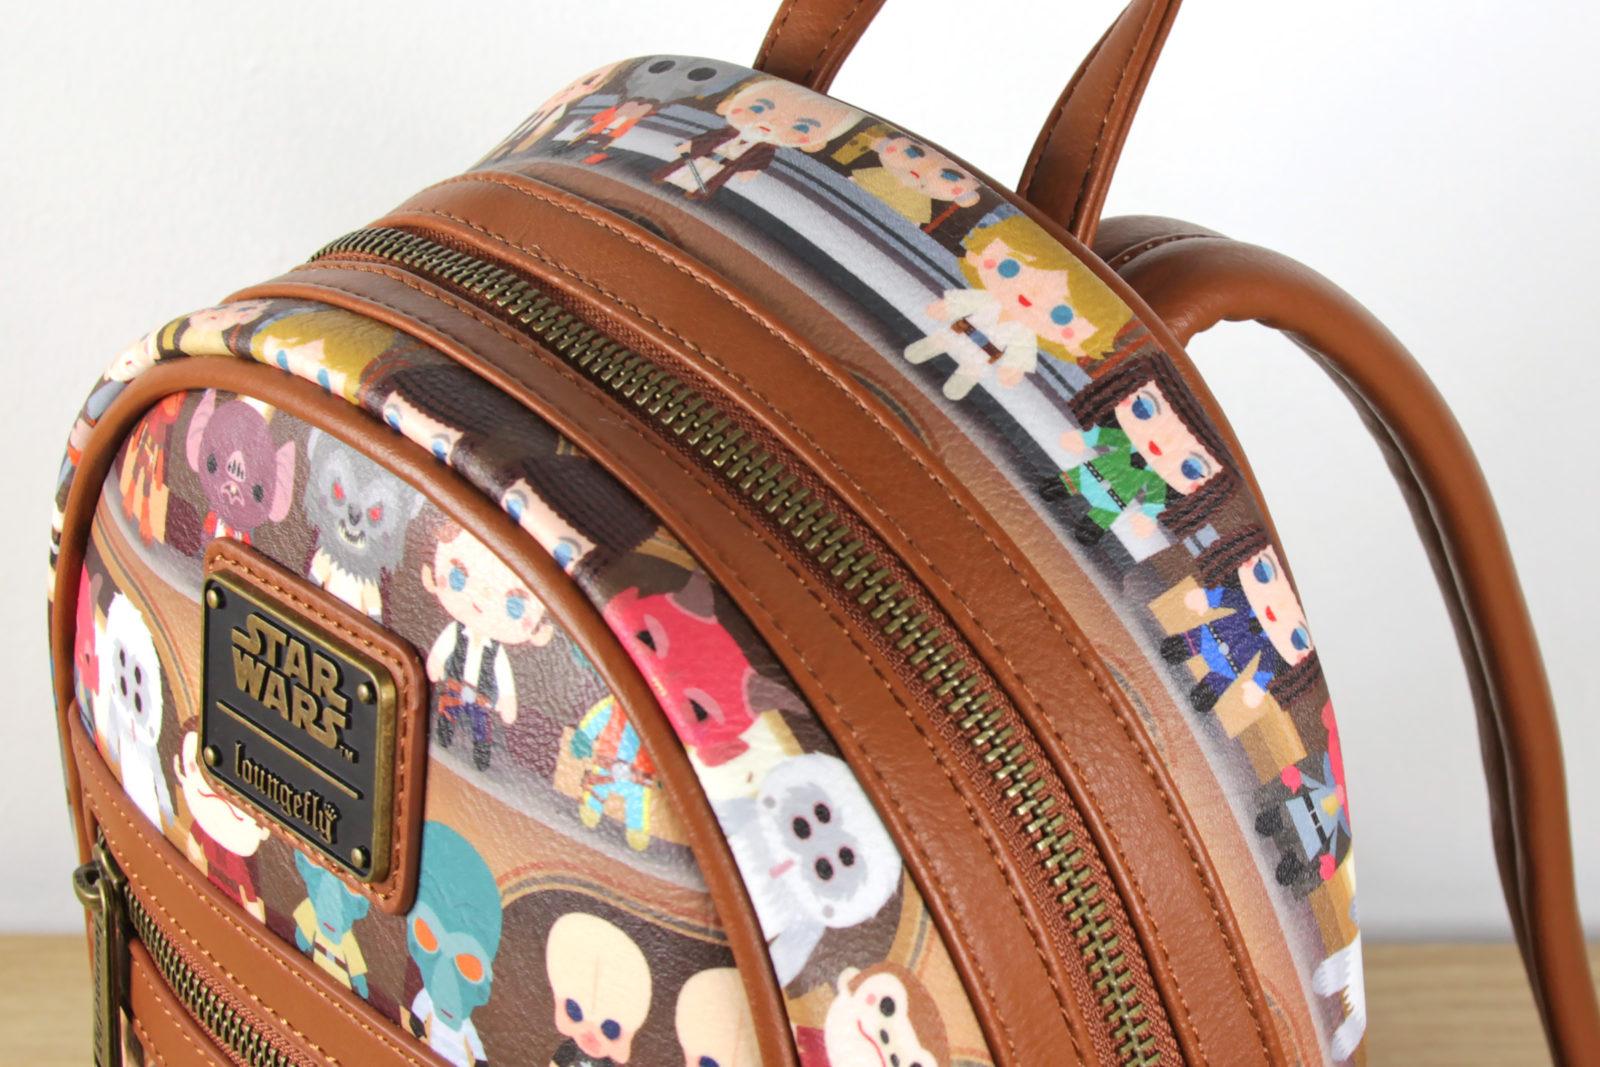 Loungefly Star Wars Cantina Backpack - Tonnika Sisters